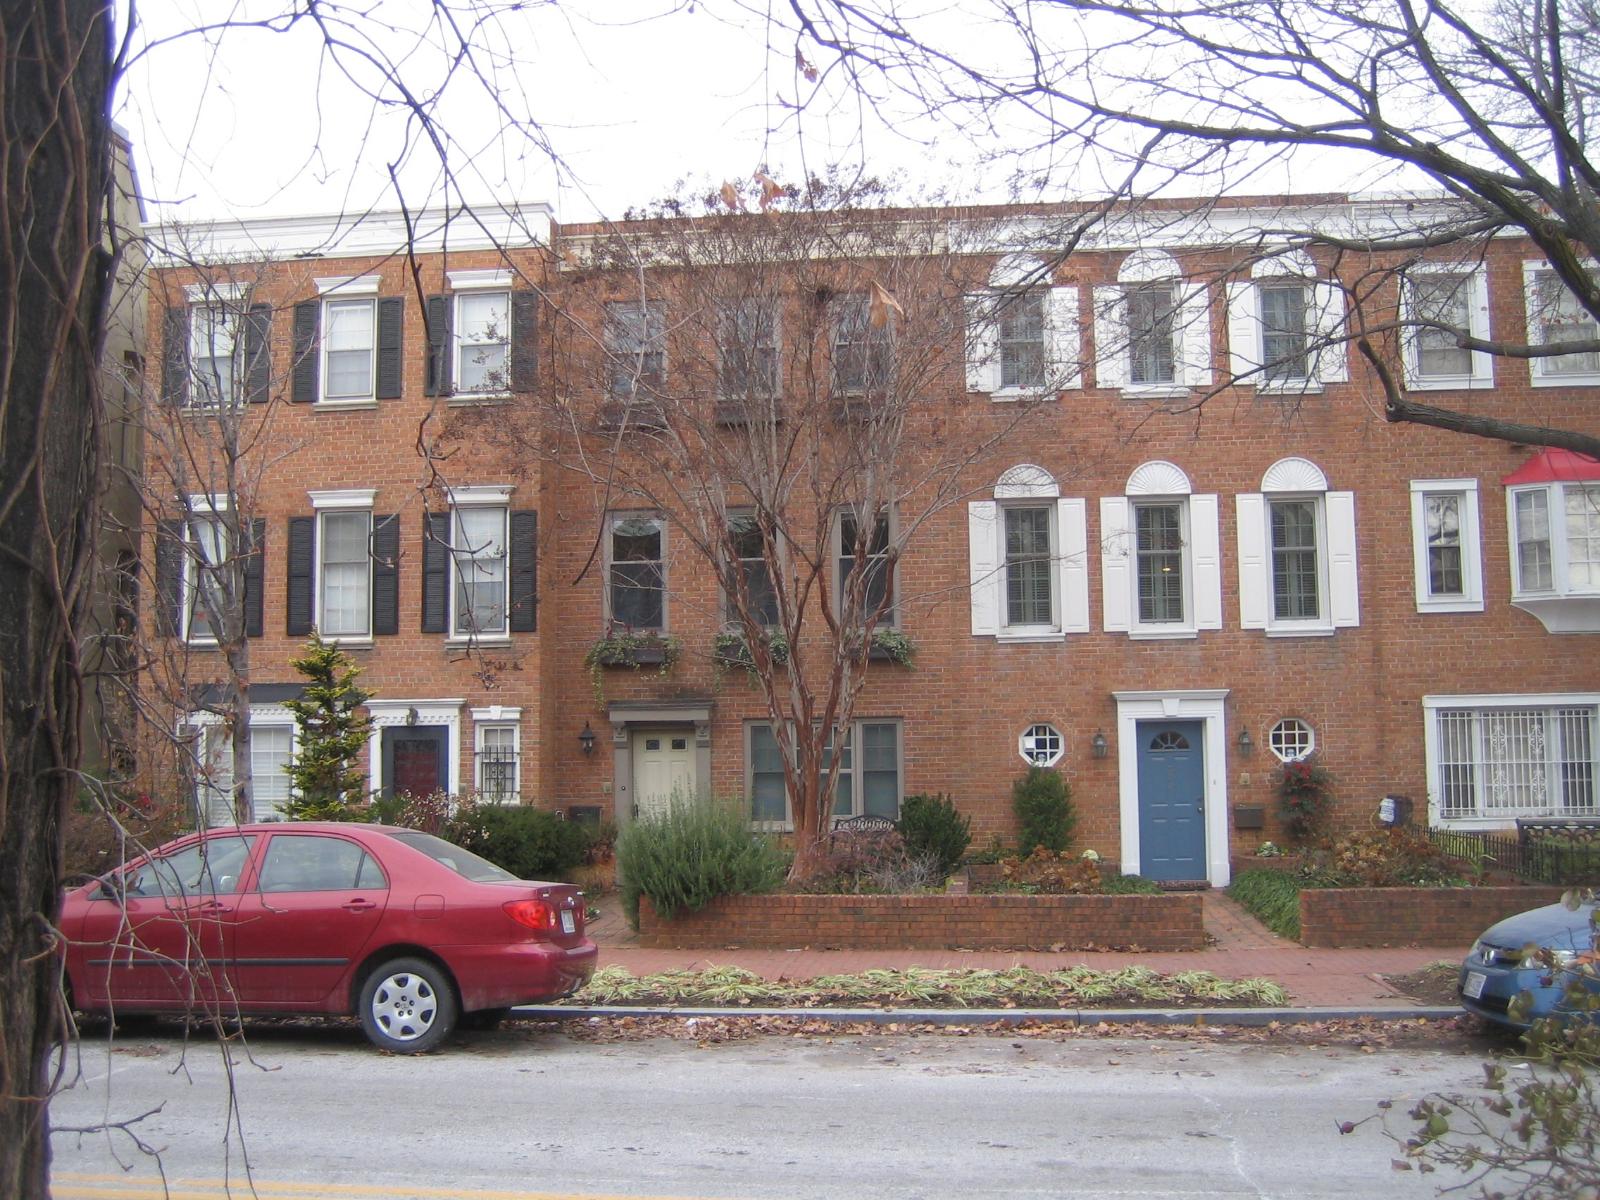 Ron Johnson Home and neighbors.